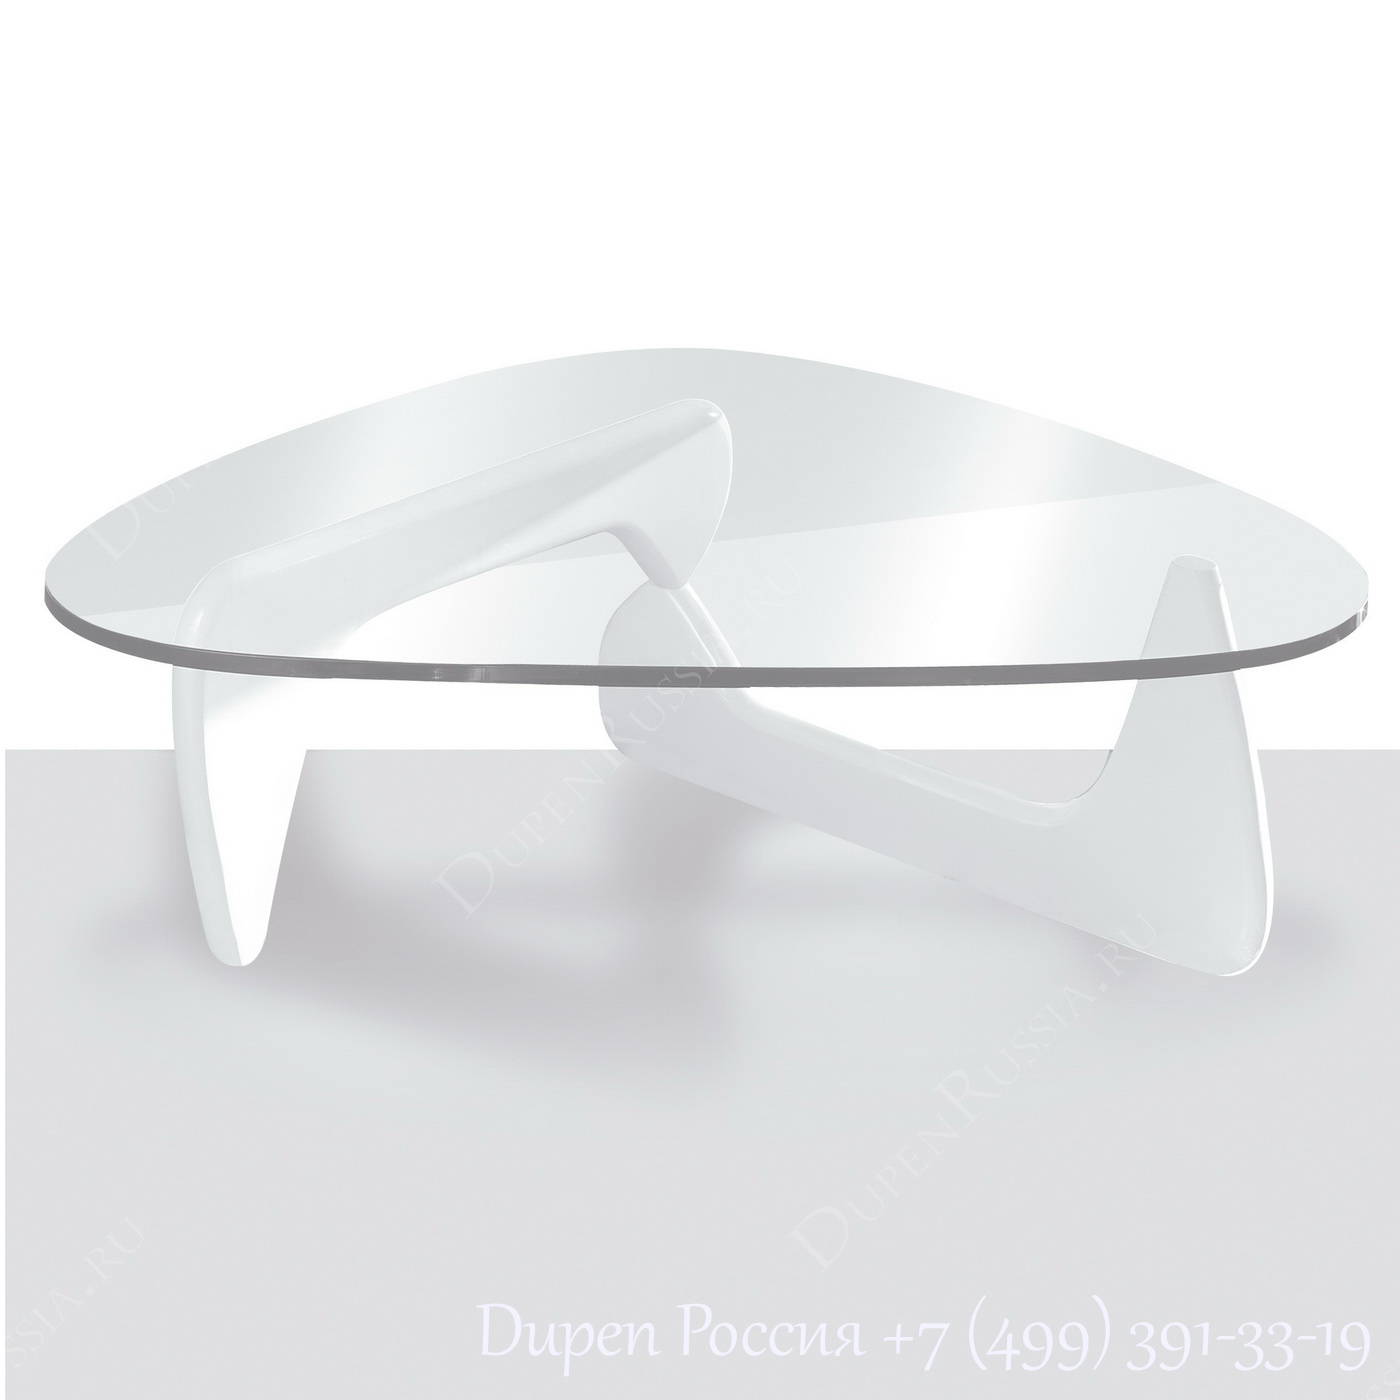 Журнальный стол DUPEN JY-A22-17 Белый